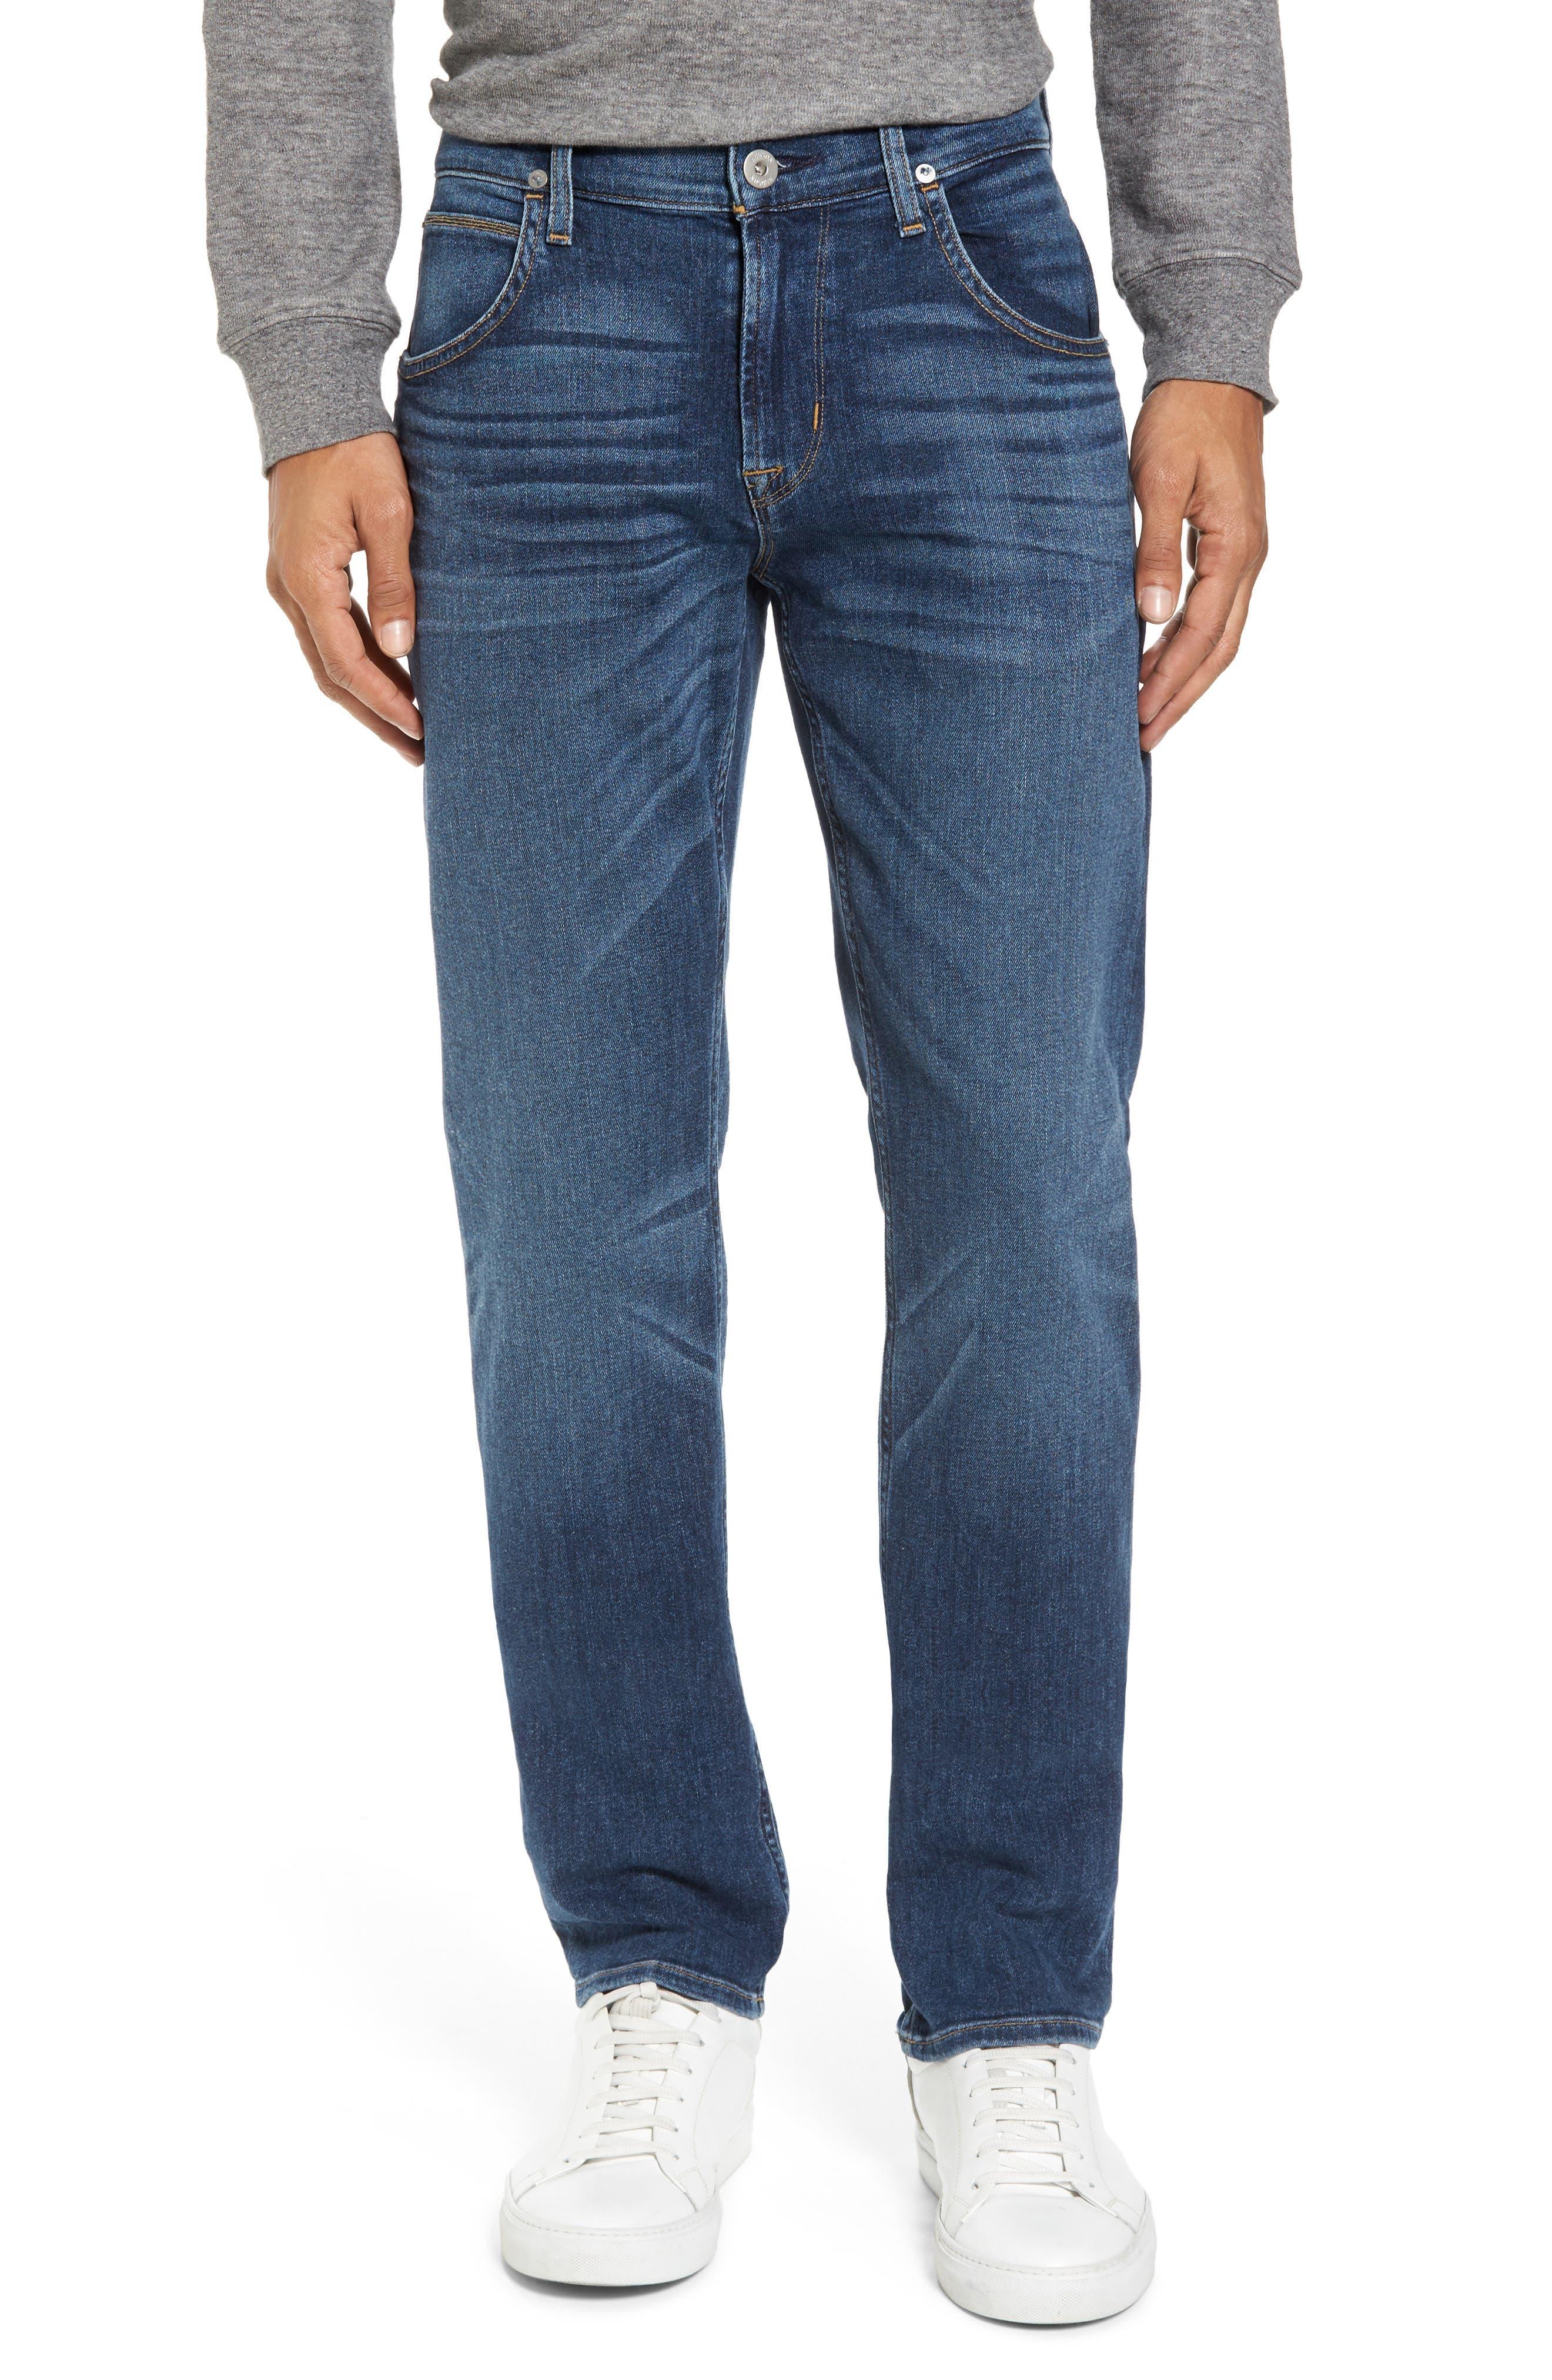 Blake Slim Fit Jeans,                             Main thumbnail 1, color,                             Calloway